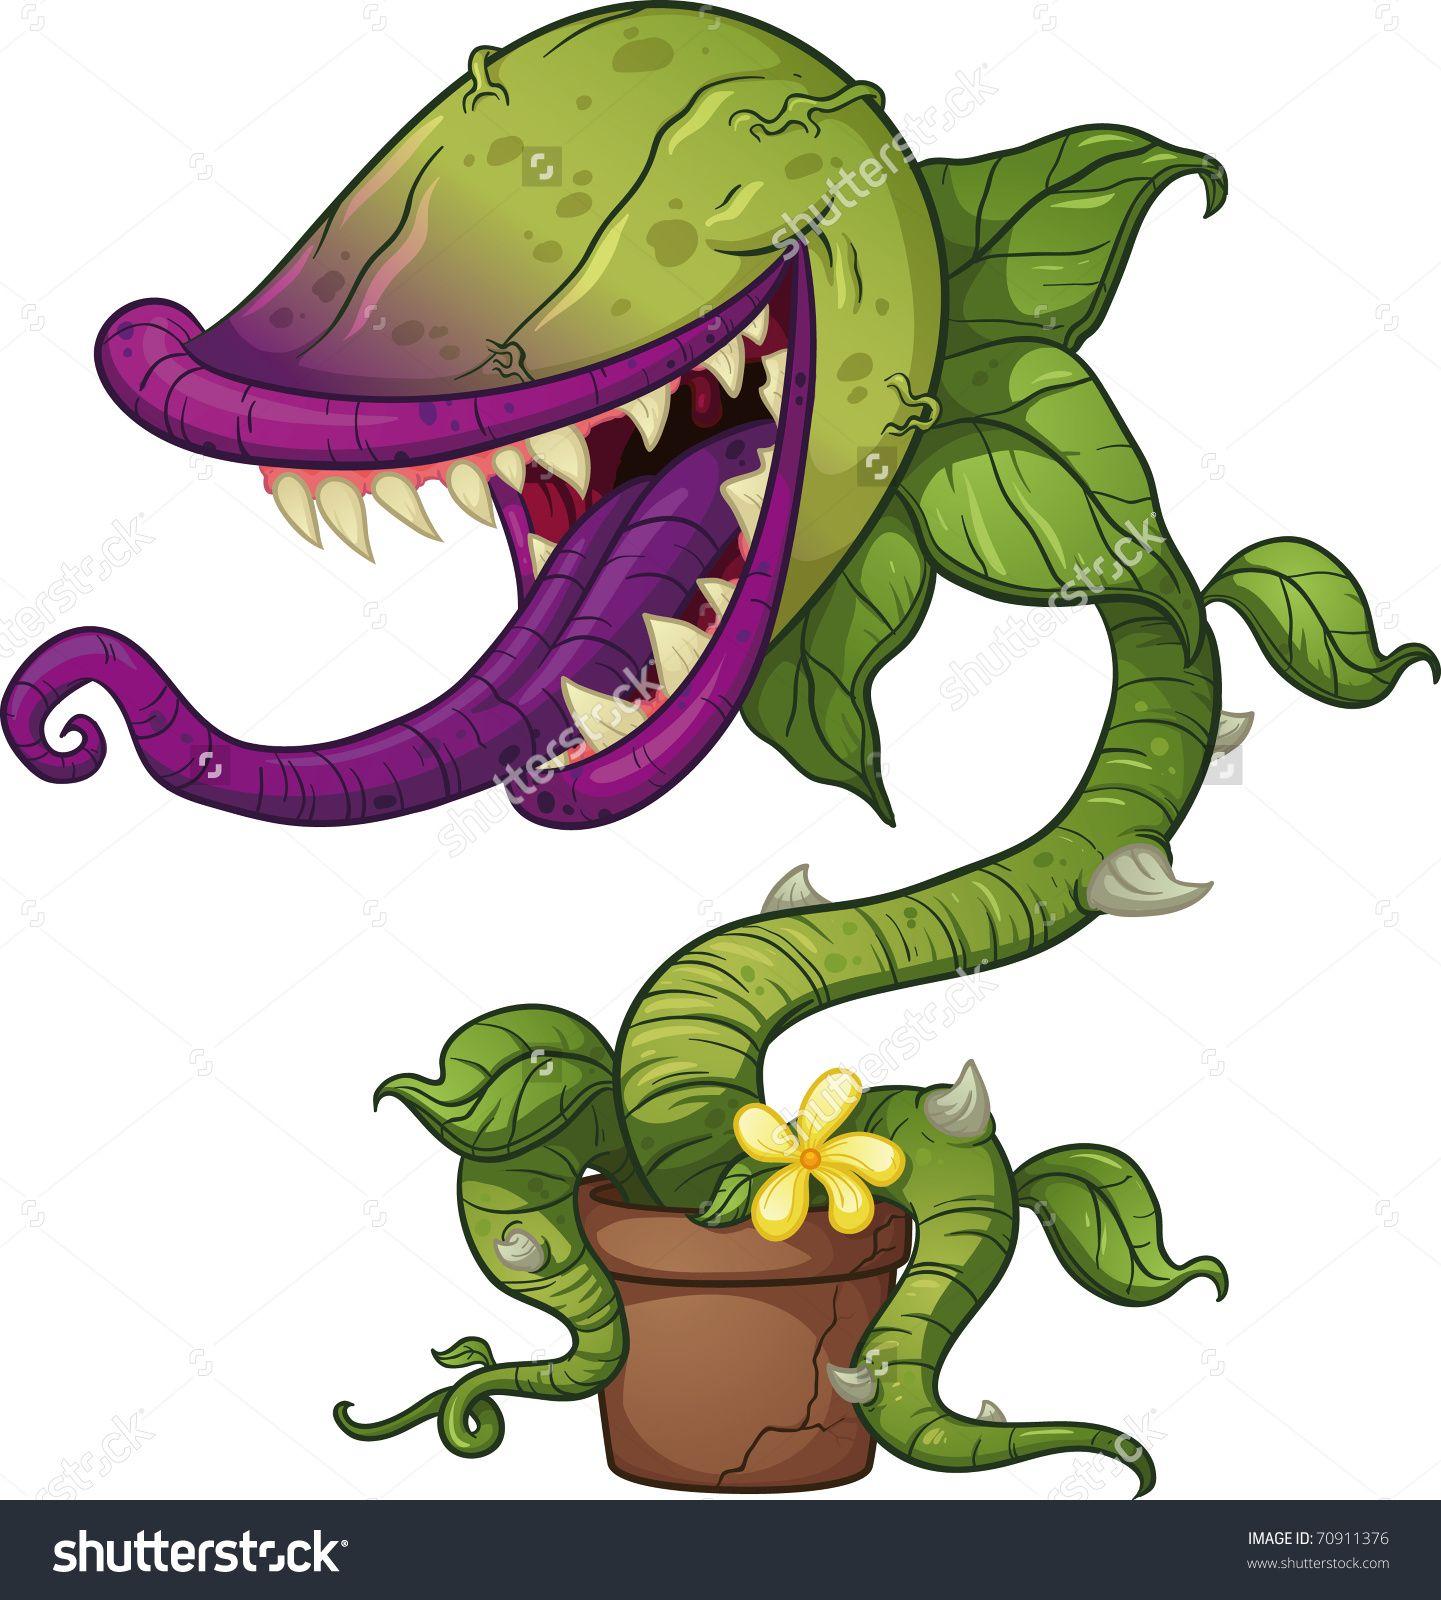 venus fly trap monster.